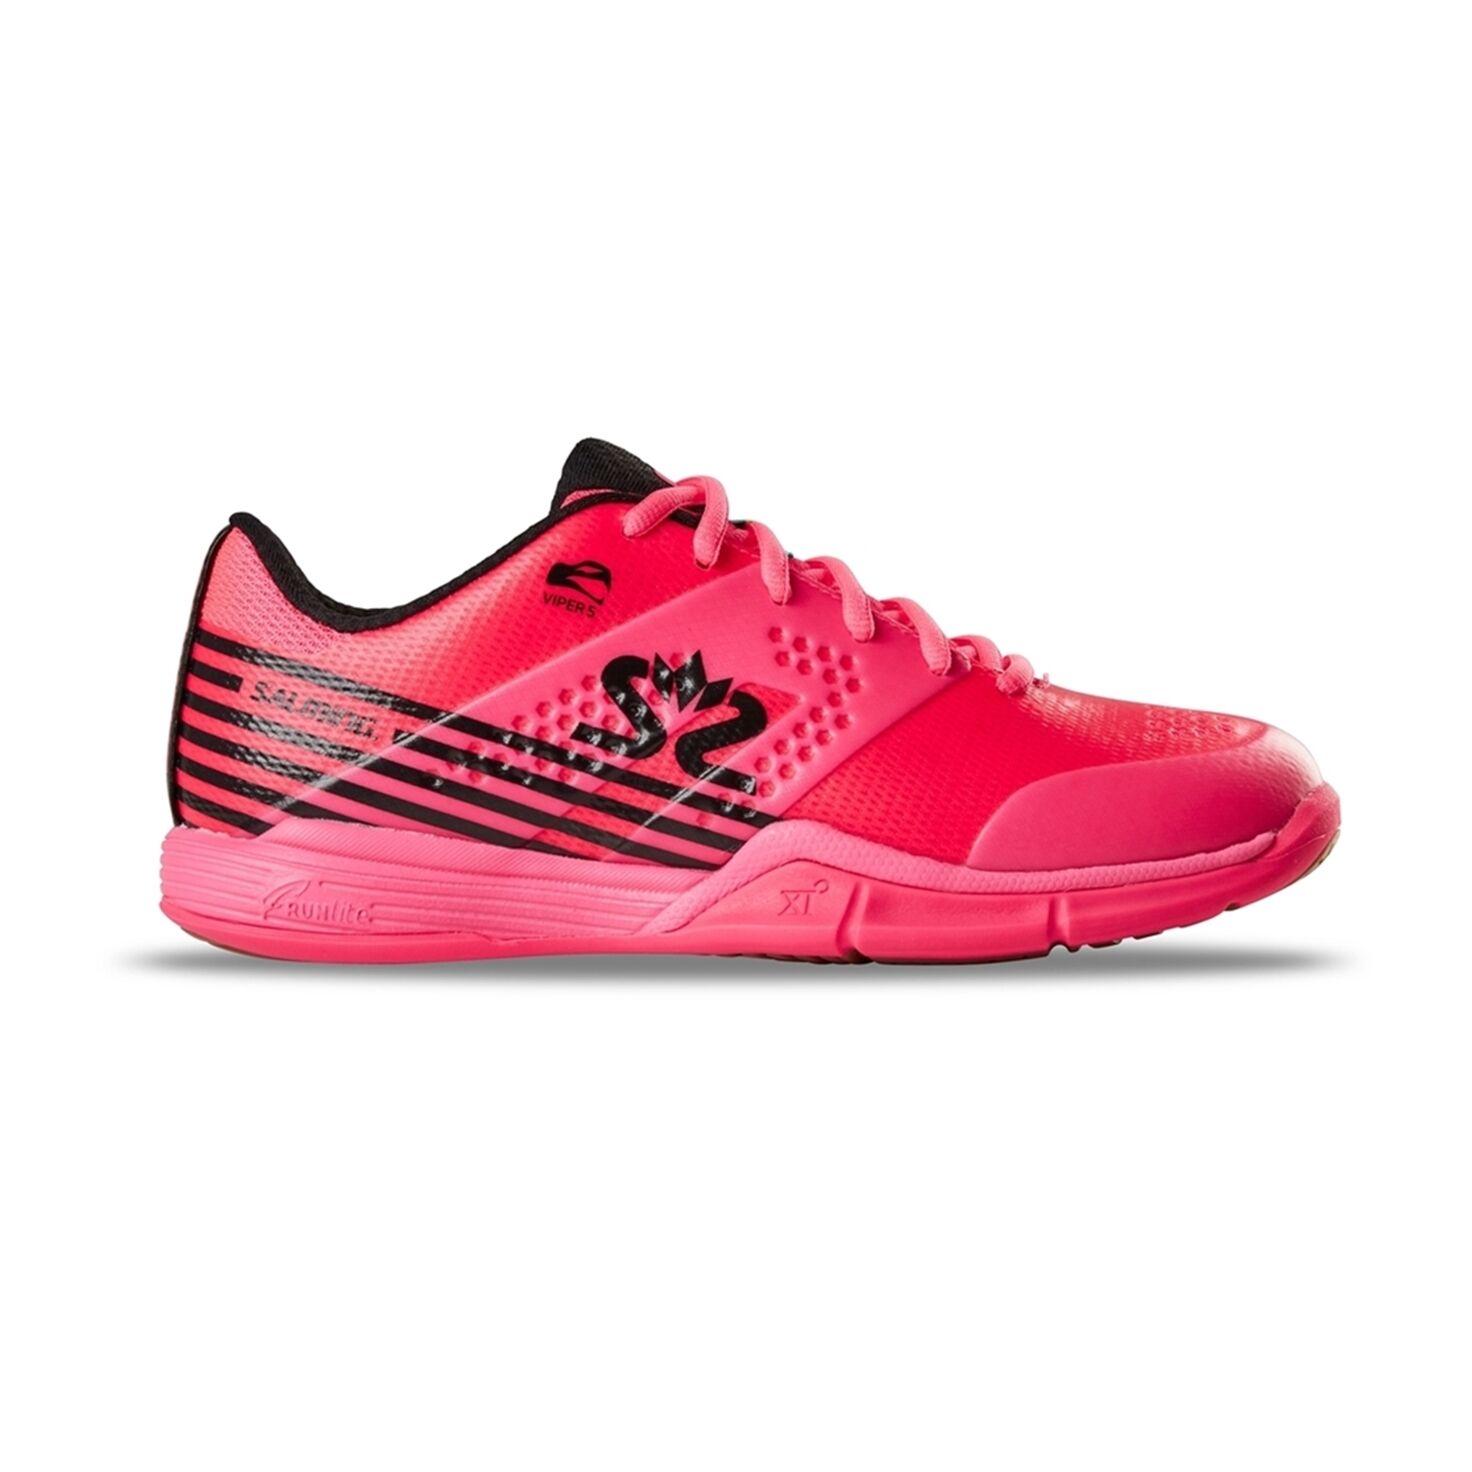 Salming Viper 5 Women Pink/Black 37 1/3